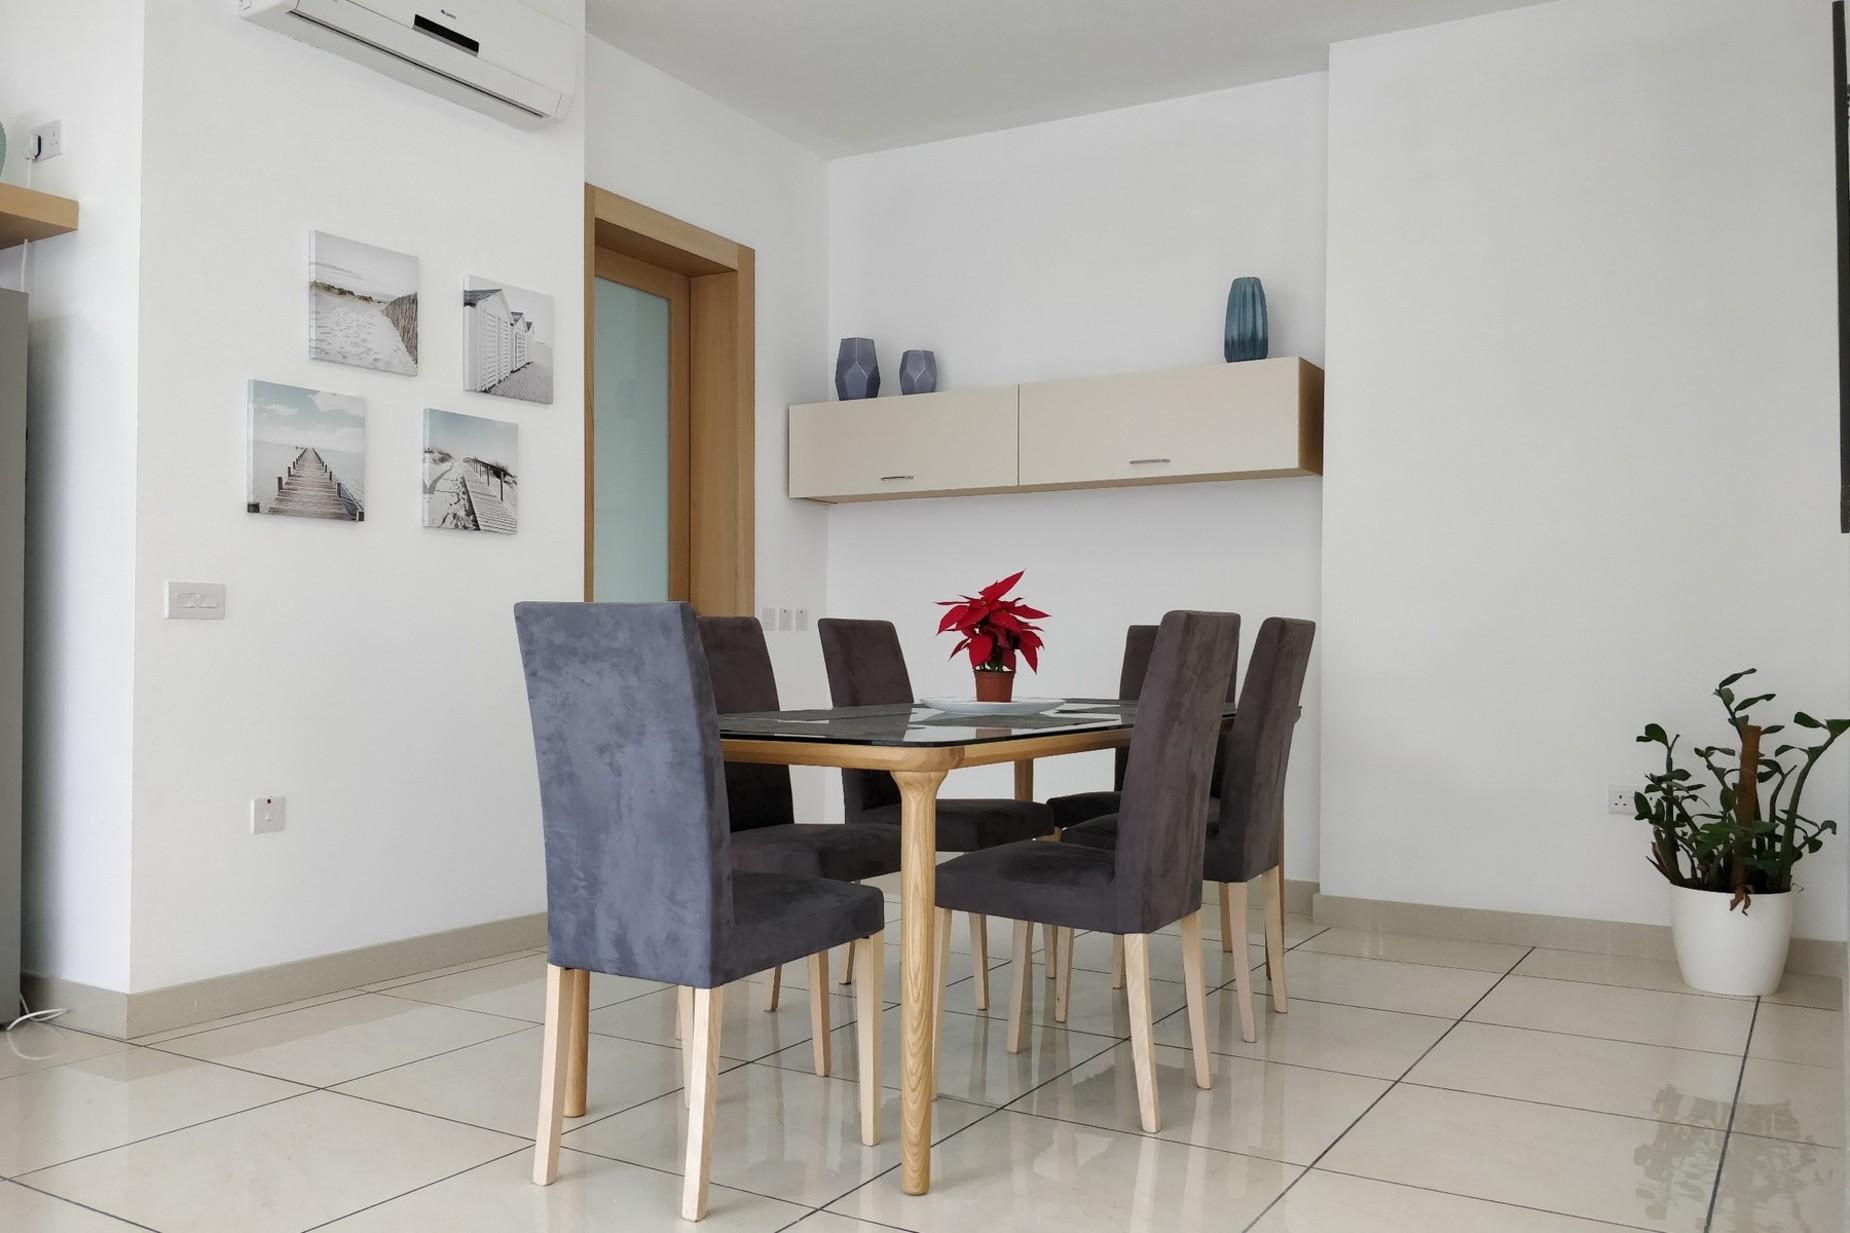 2 bed Penthouse For Rent in Gzira, Gzira - thumb 7